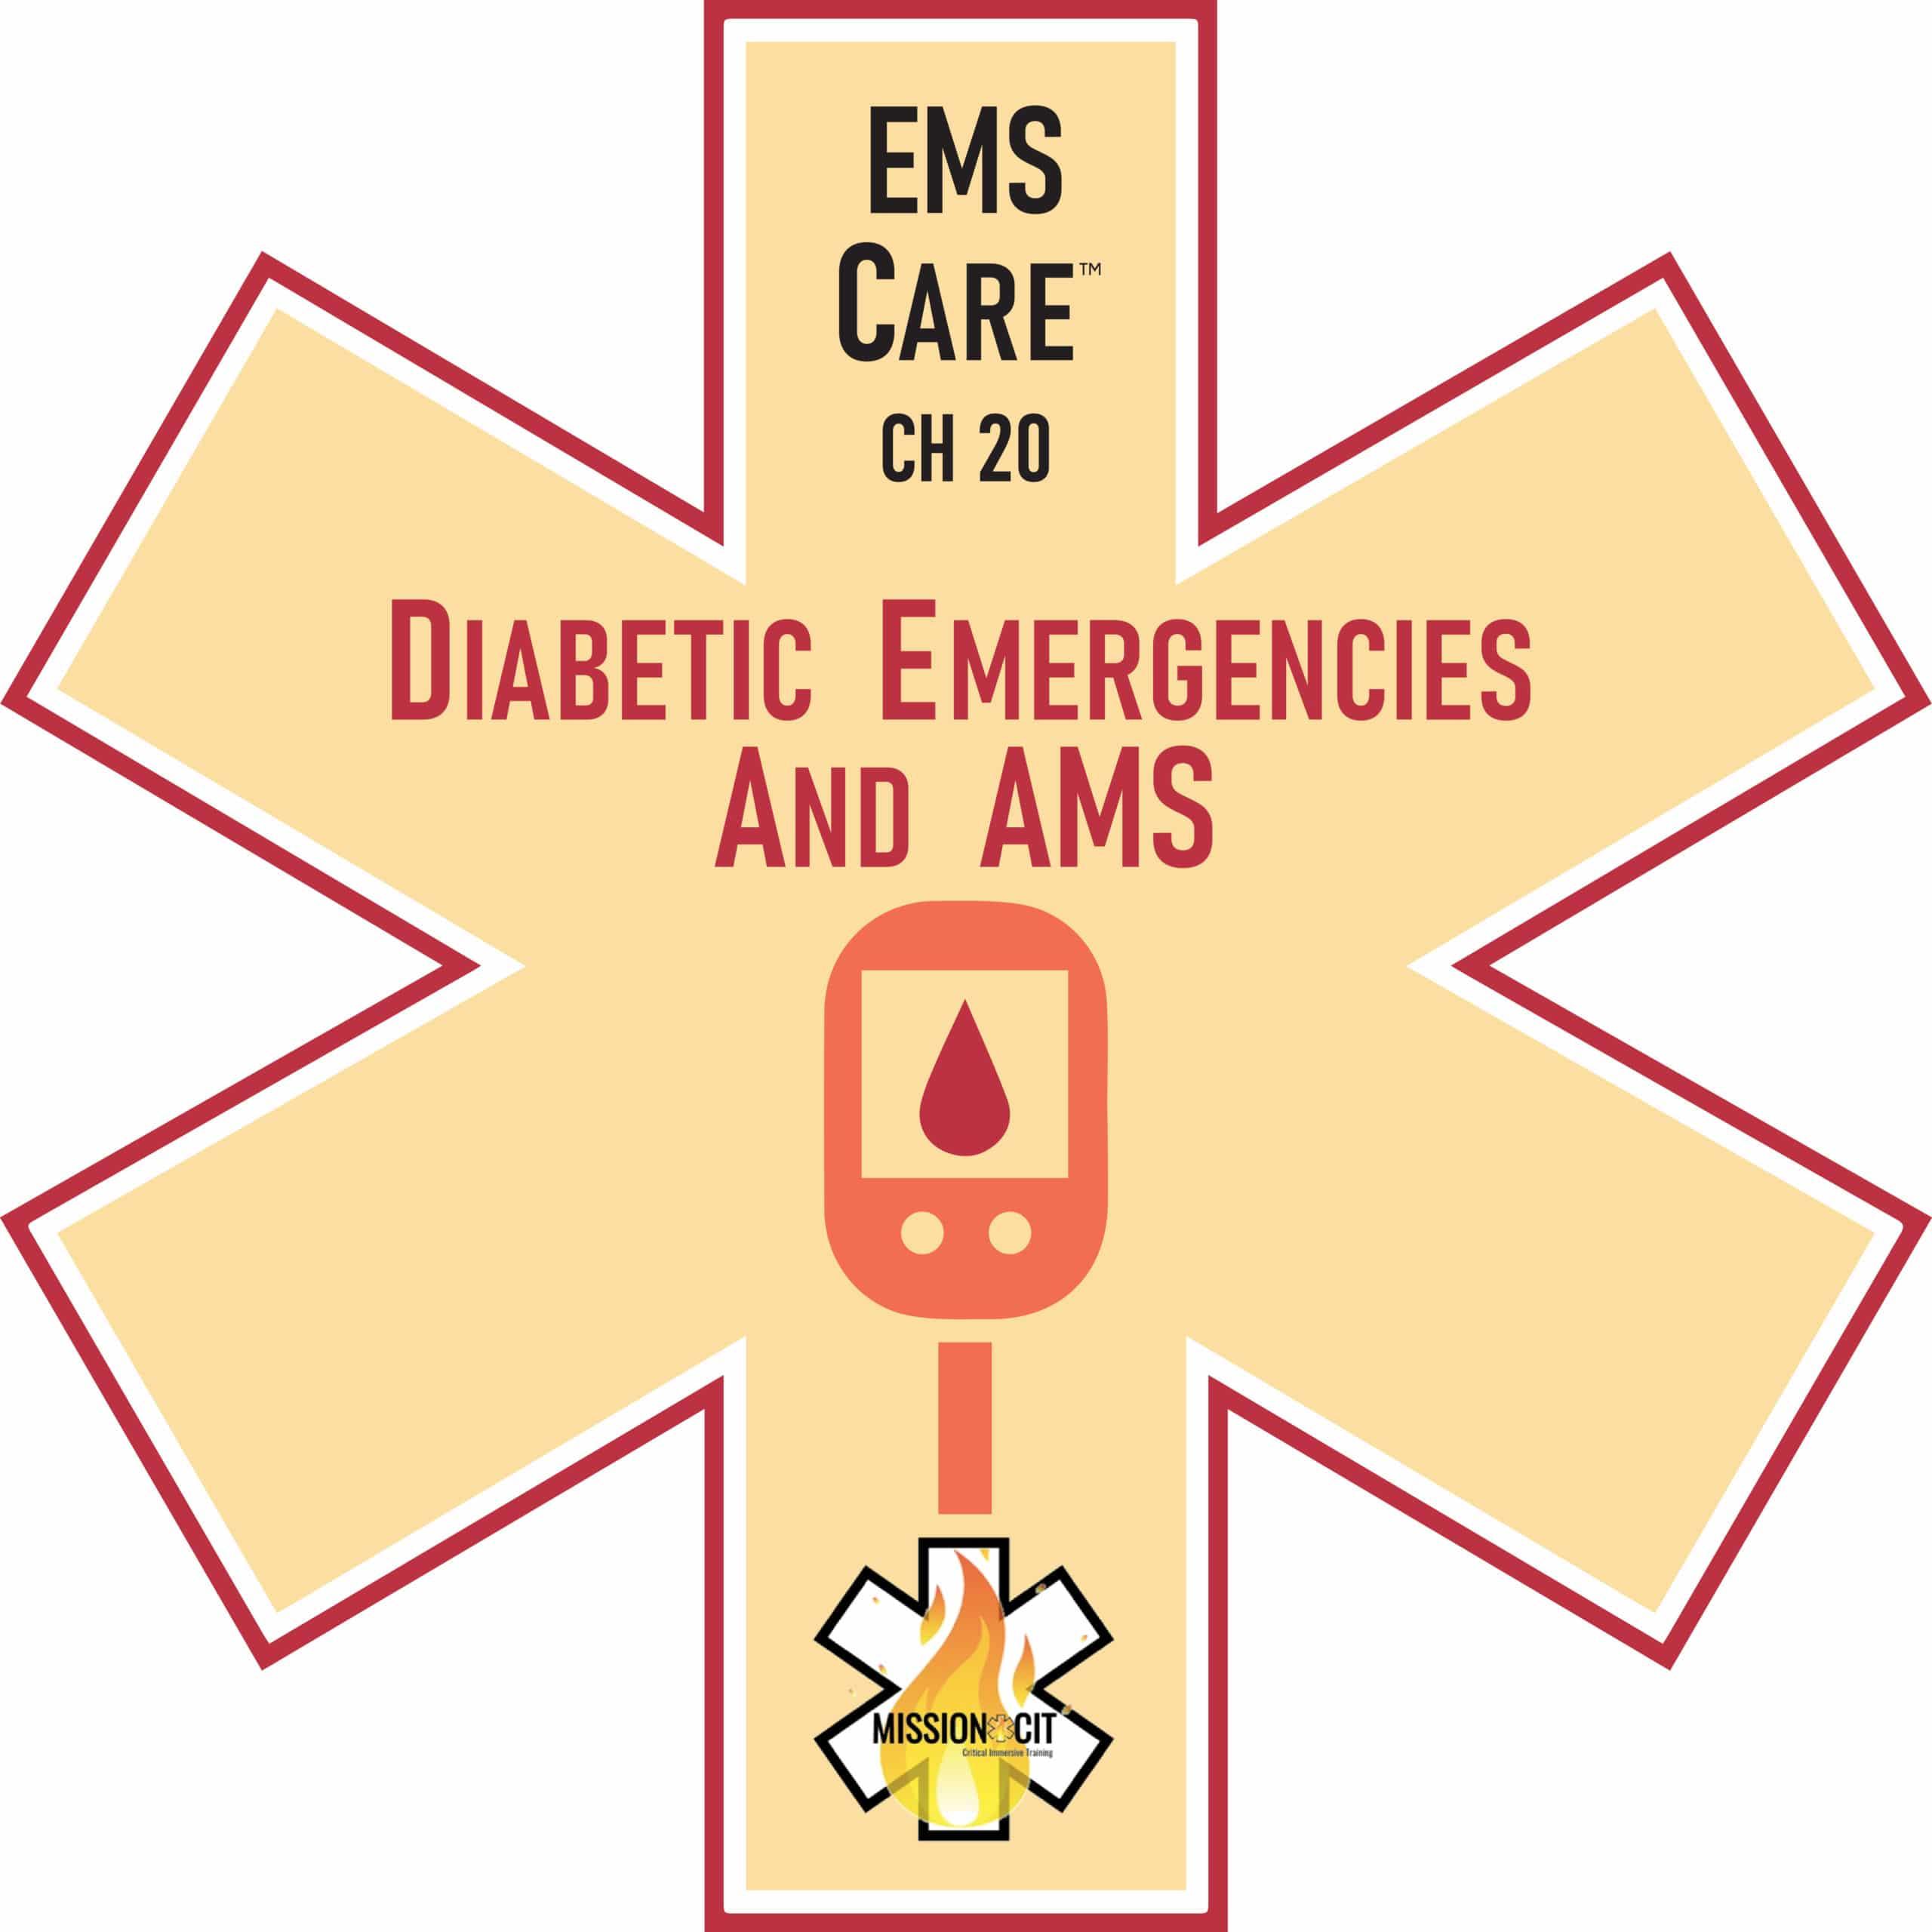 EMT Diabetic Emergencies Scenarios | Altered Mental Status | Diabetic emergency treatment | EMT treatment for hyperglycemia | hypoglycemia